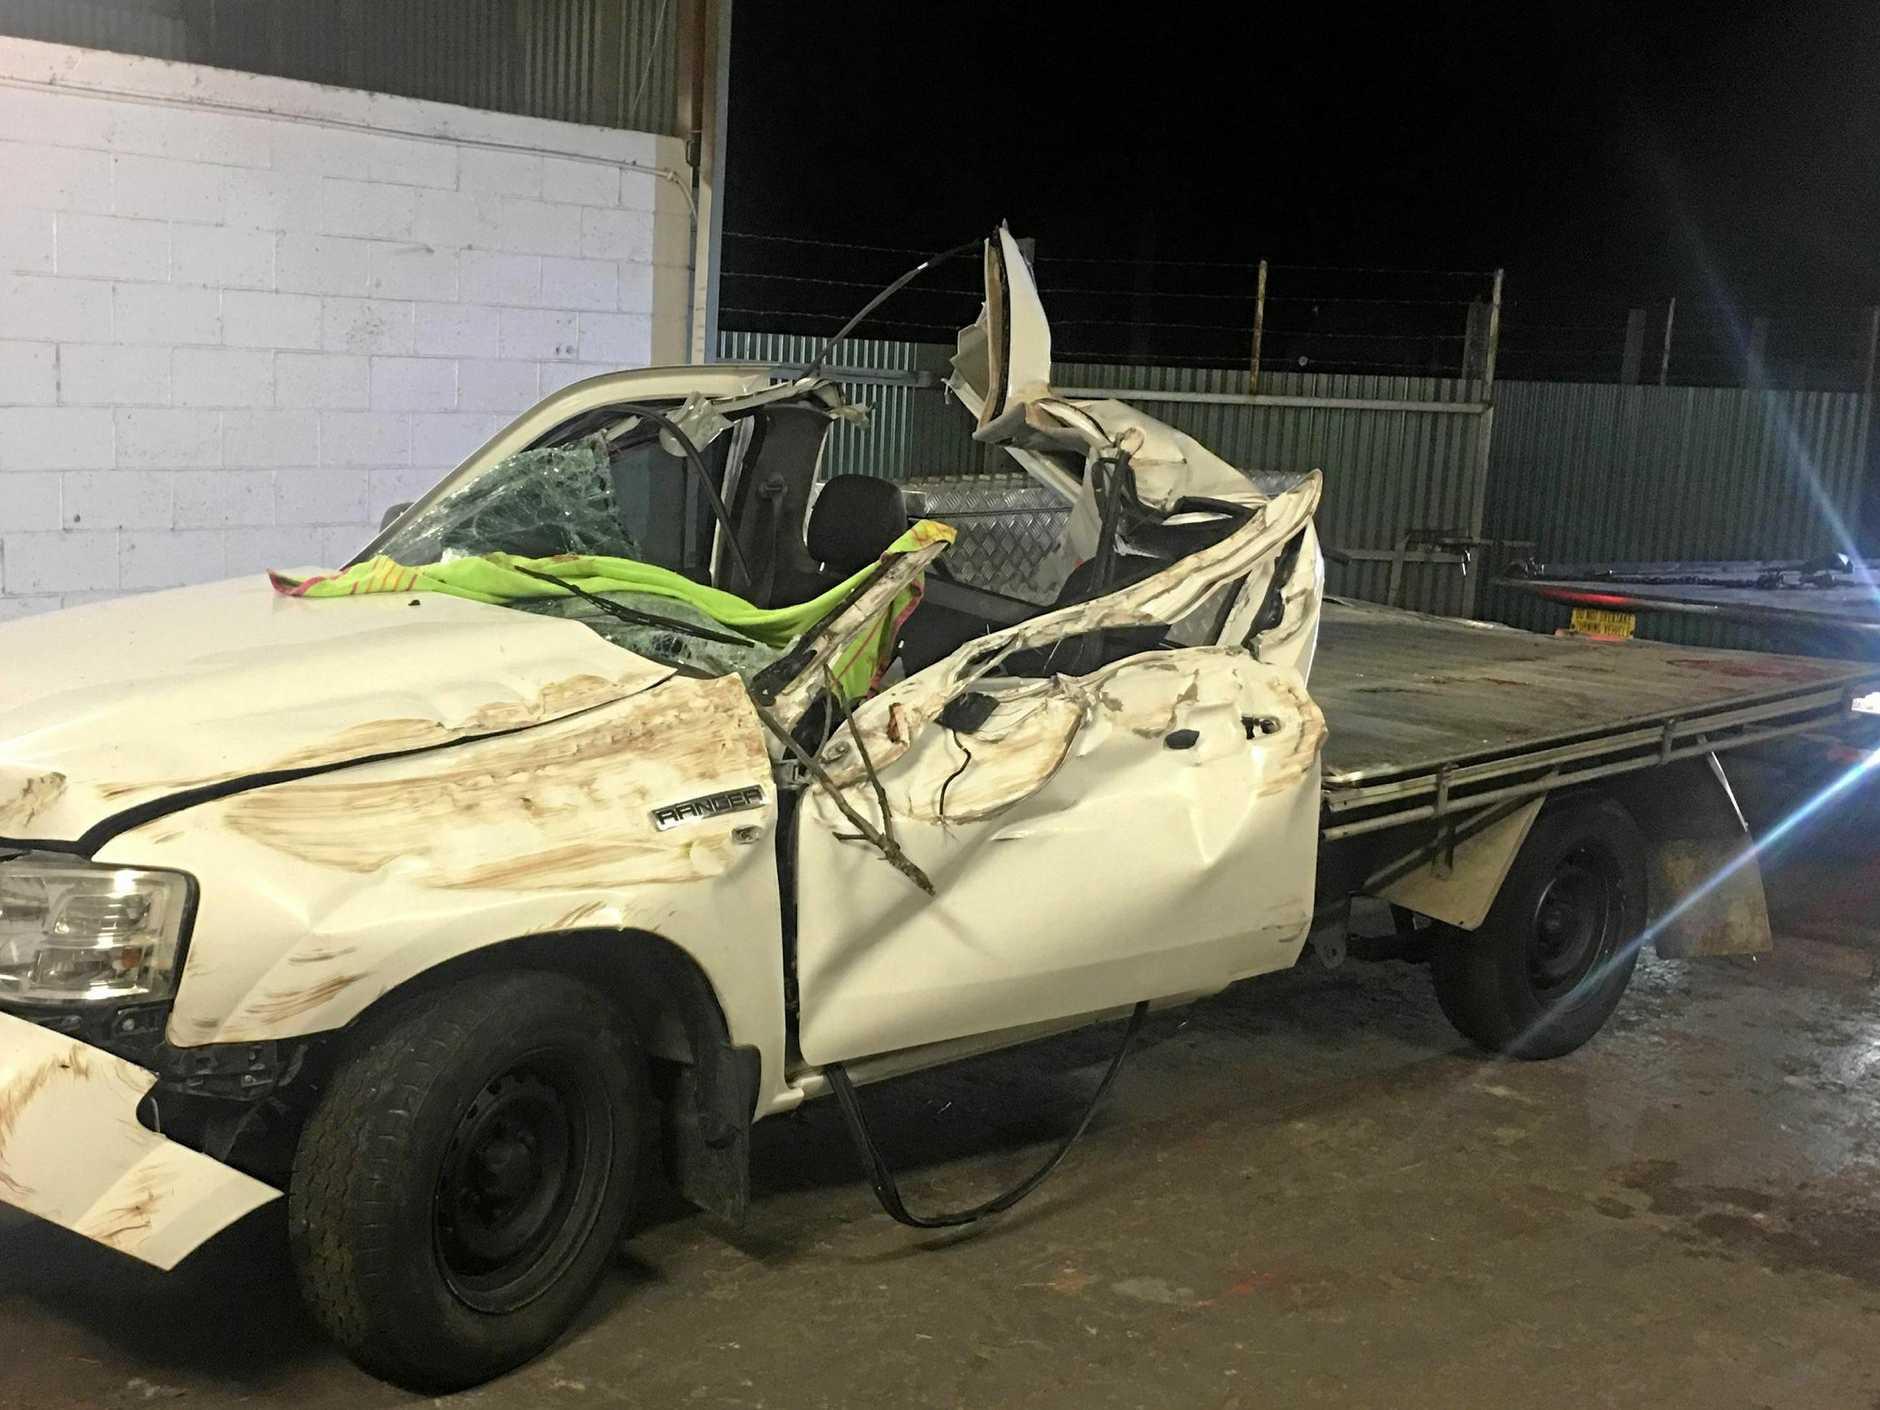 CRASH: Fatality occured on Pacific Boulevard at Buddina, near Kawana, about 7.20pm before crashing into a tree.